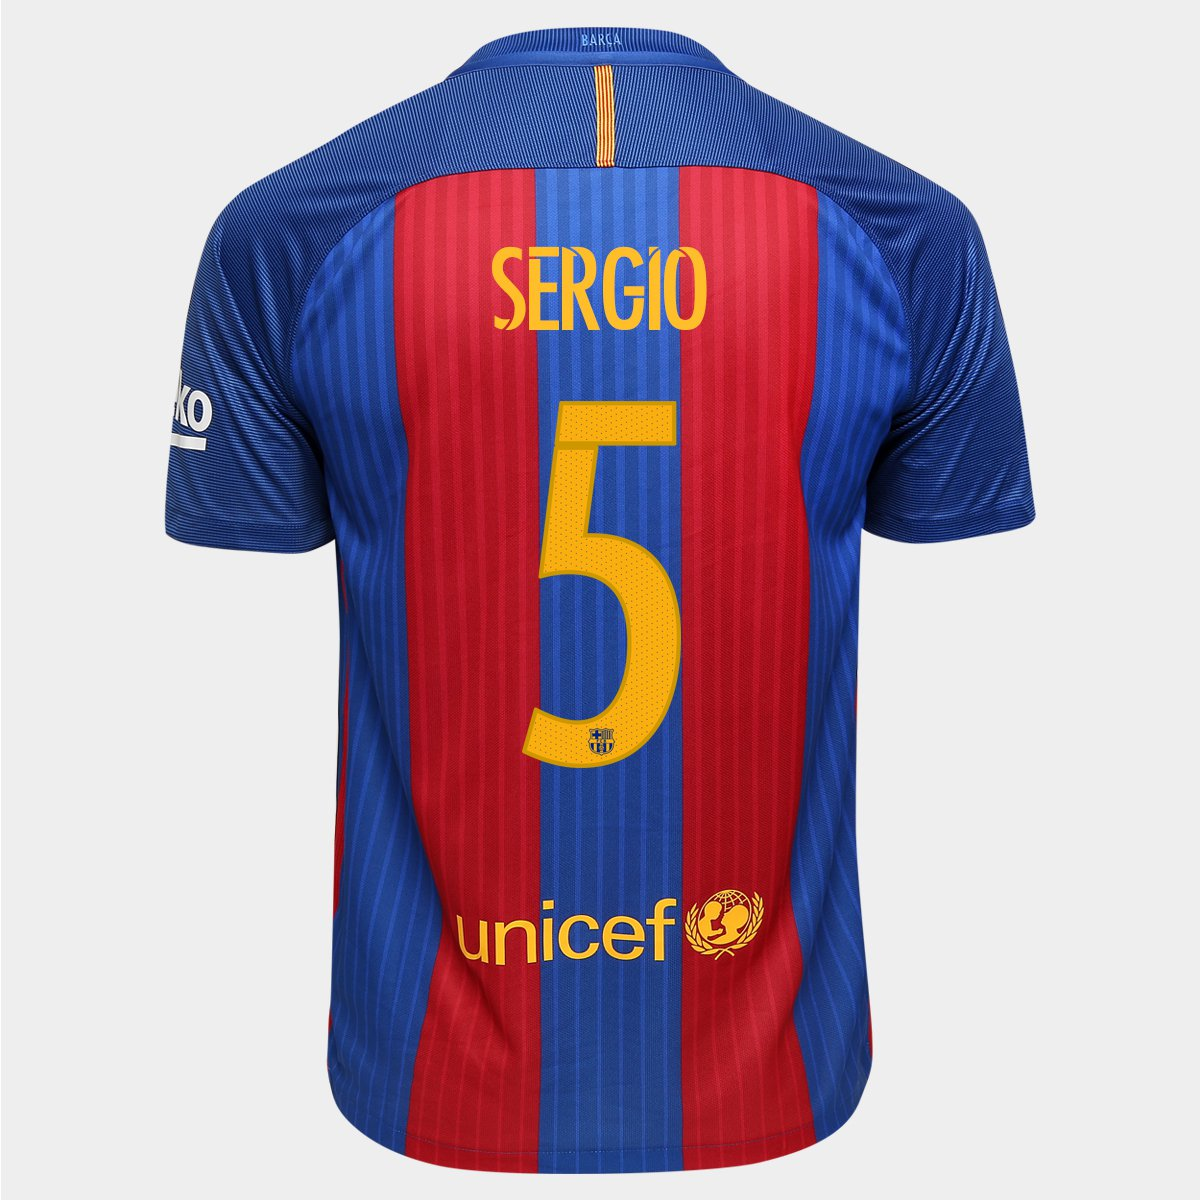 Camisa Nike Barcelona Home 16 17 Nº 5 - Sergio - Compre Agora   Netshoes 691ac70acb